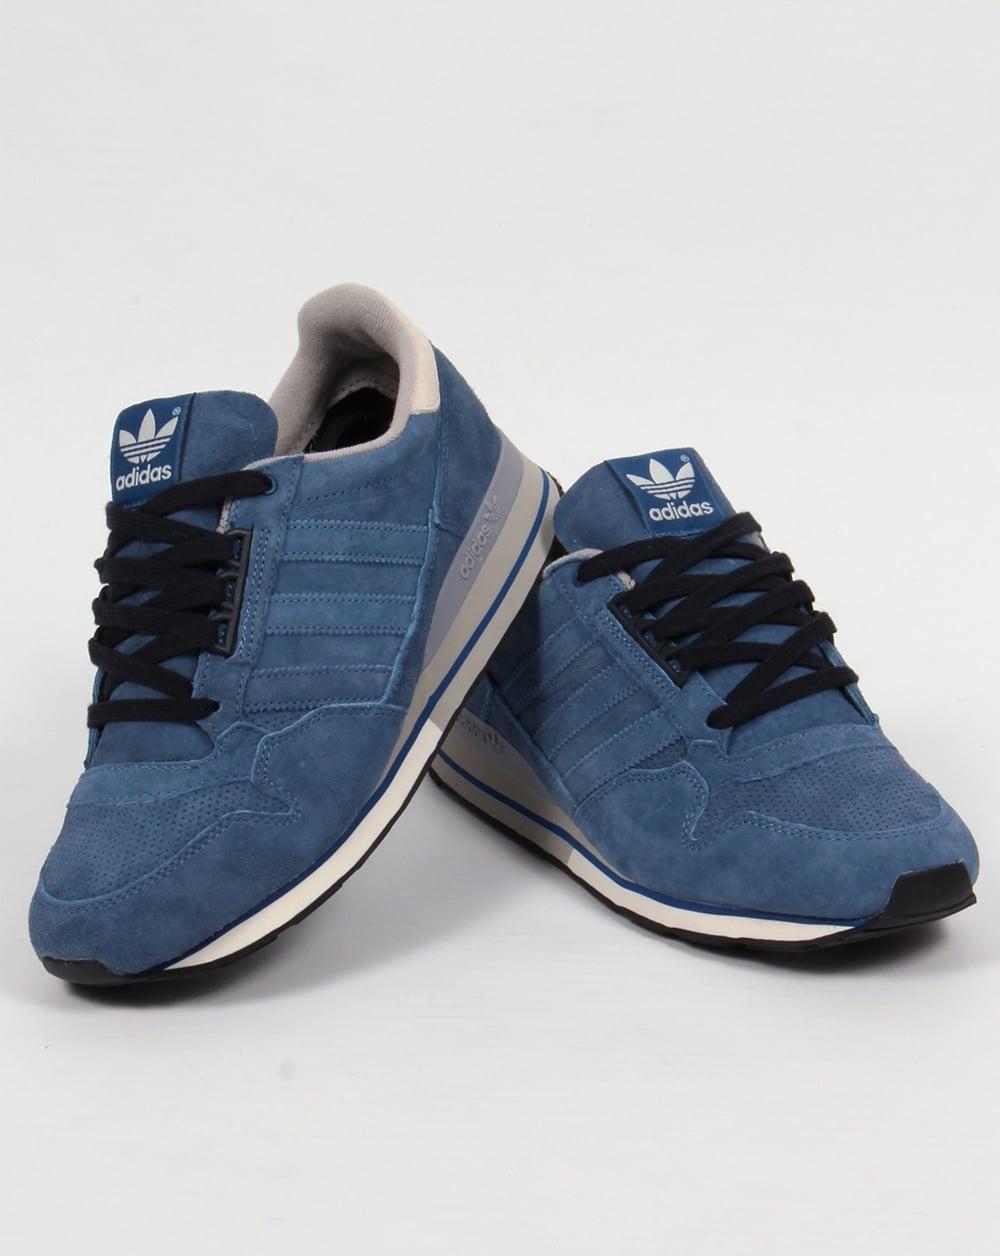 adidas zx blu e rosse